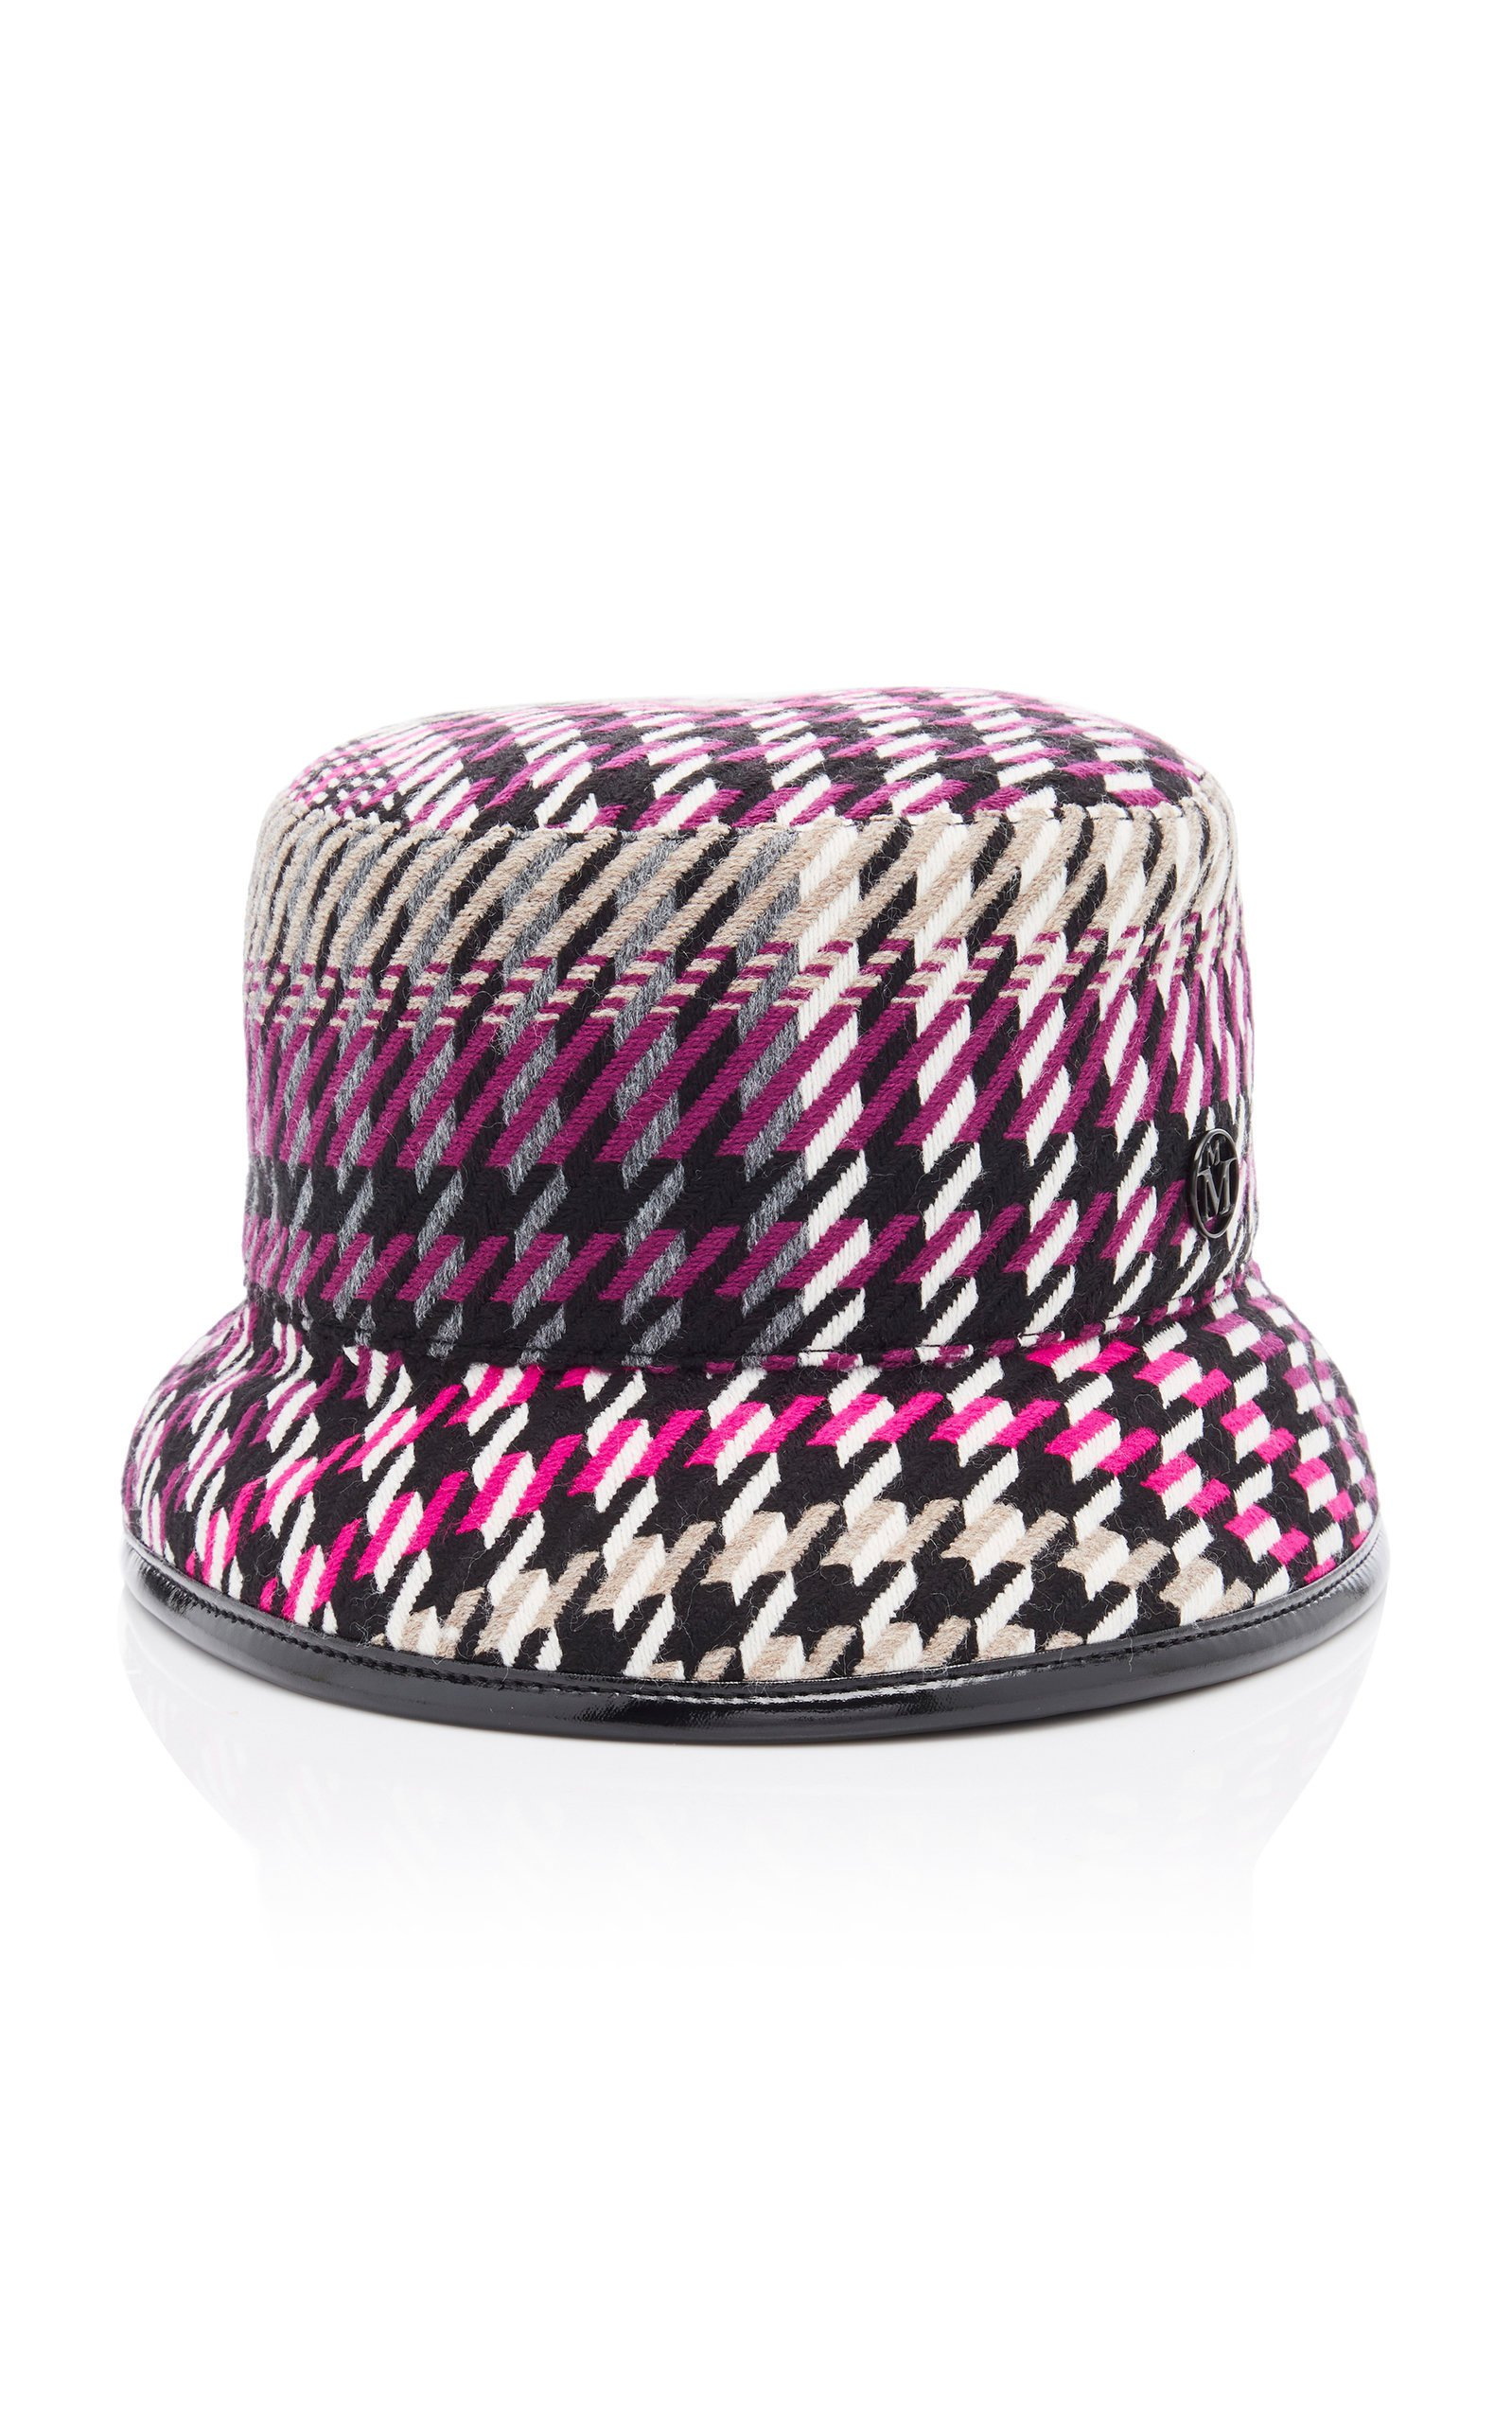 Maison Michel Jason Printed Vinyl Bucket Hat Size: L